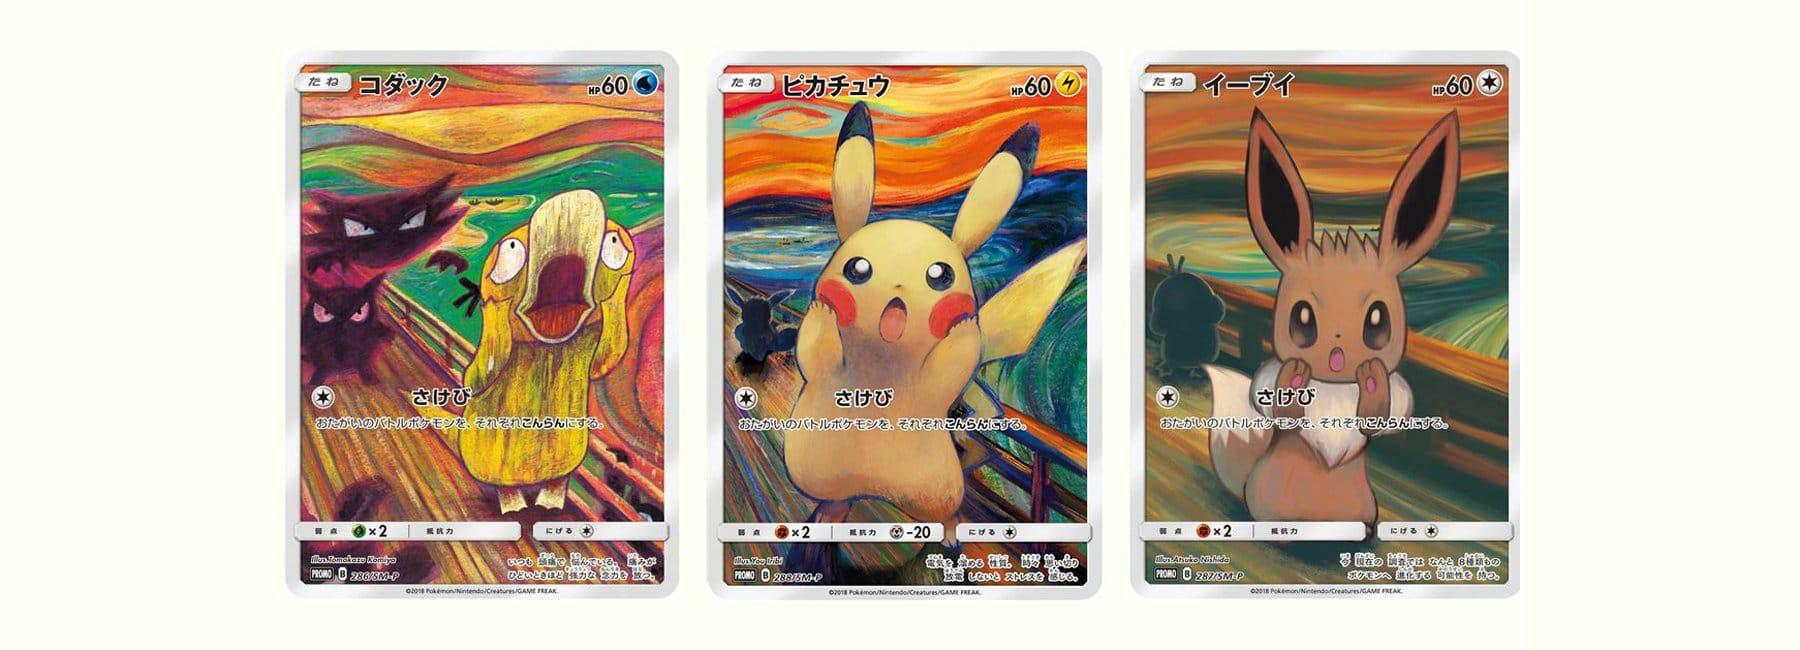 Pokémon trifft auf Der Schrei. (Foto: Pokémon Company)